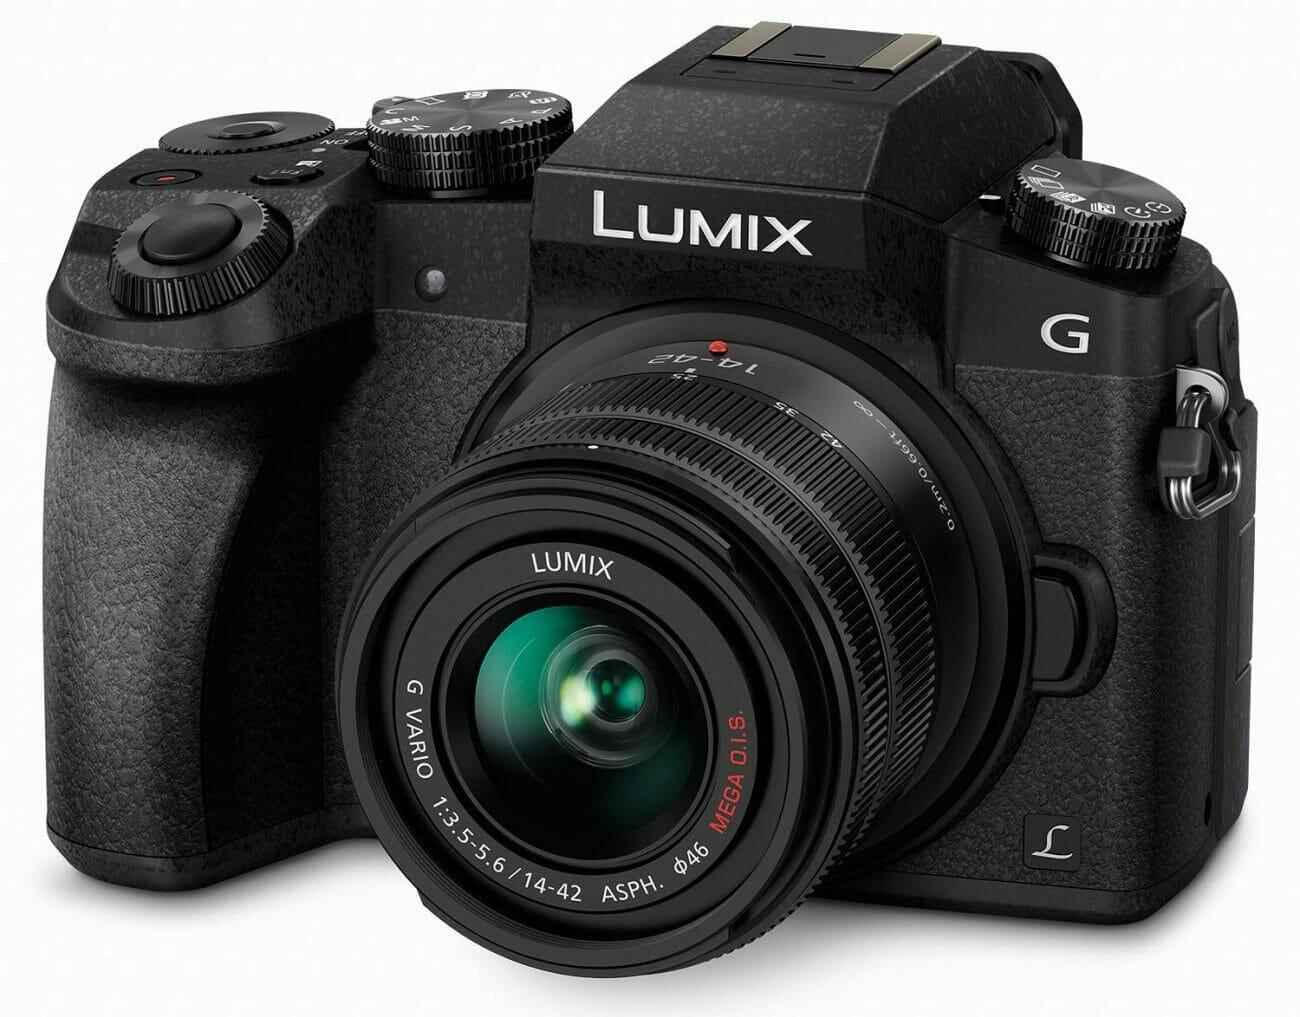 La cámara Panasonic Lumix G7